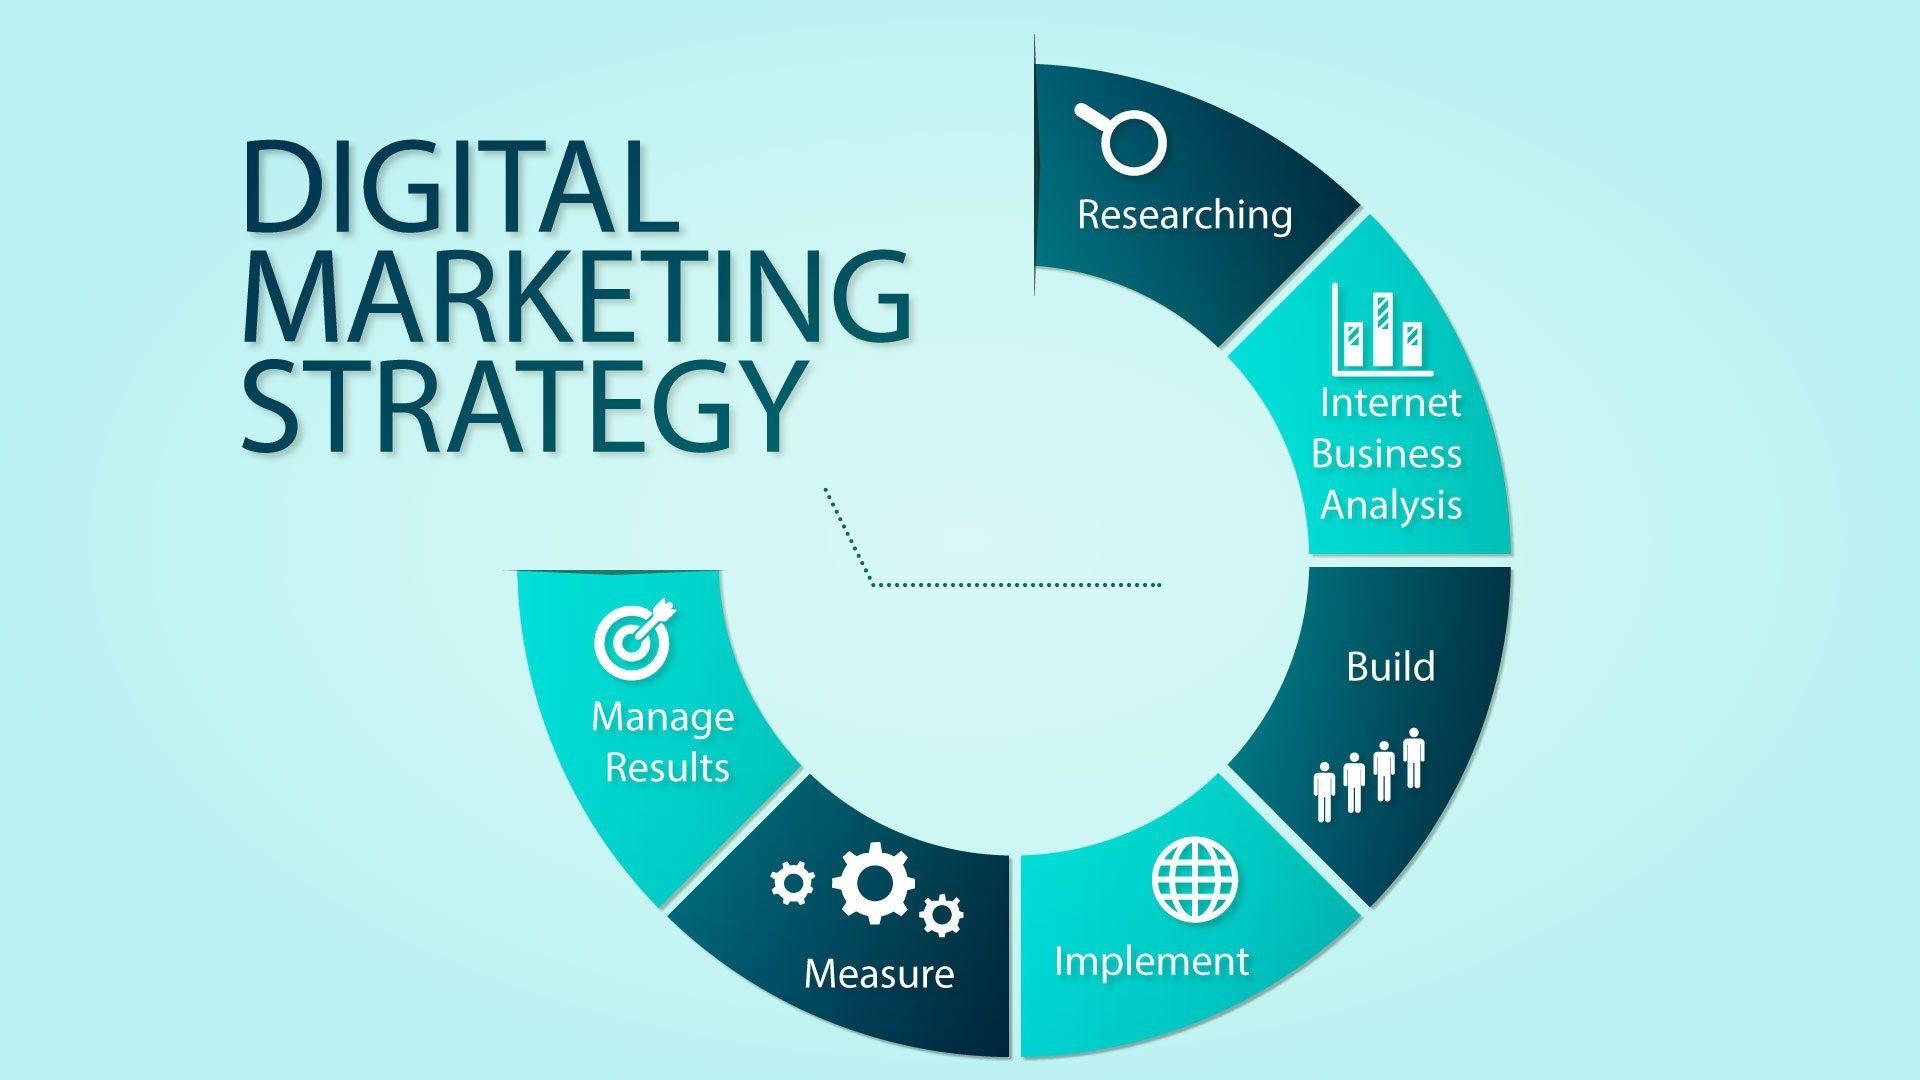 007 Top Digital Marketing Plan Template 2019 High Resolution 1920